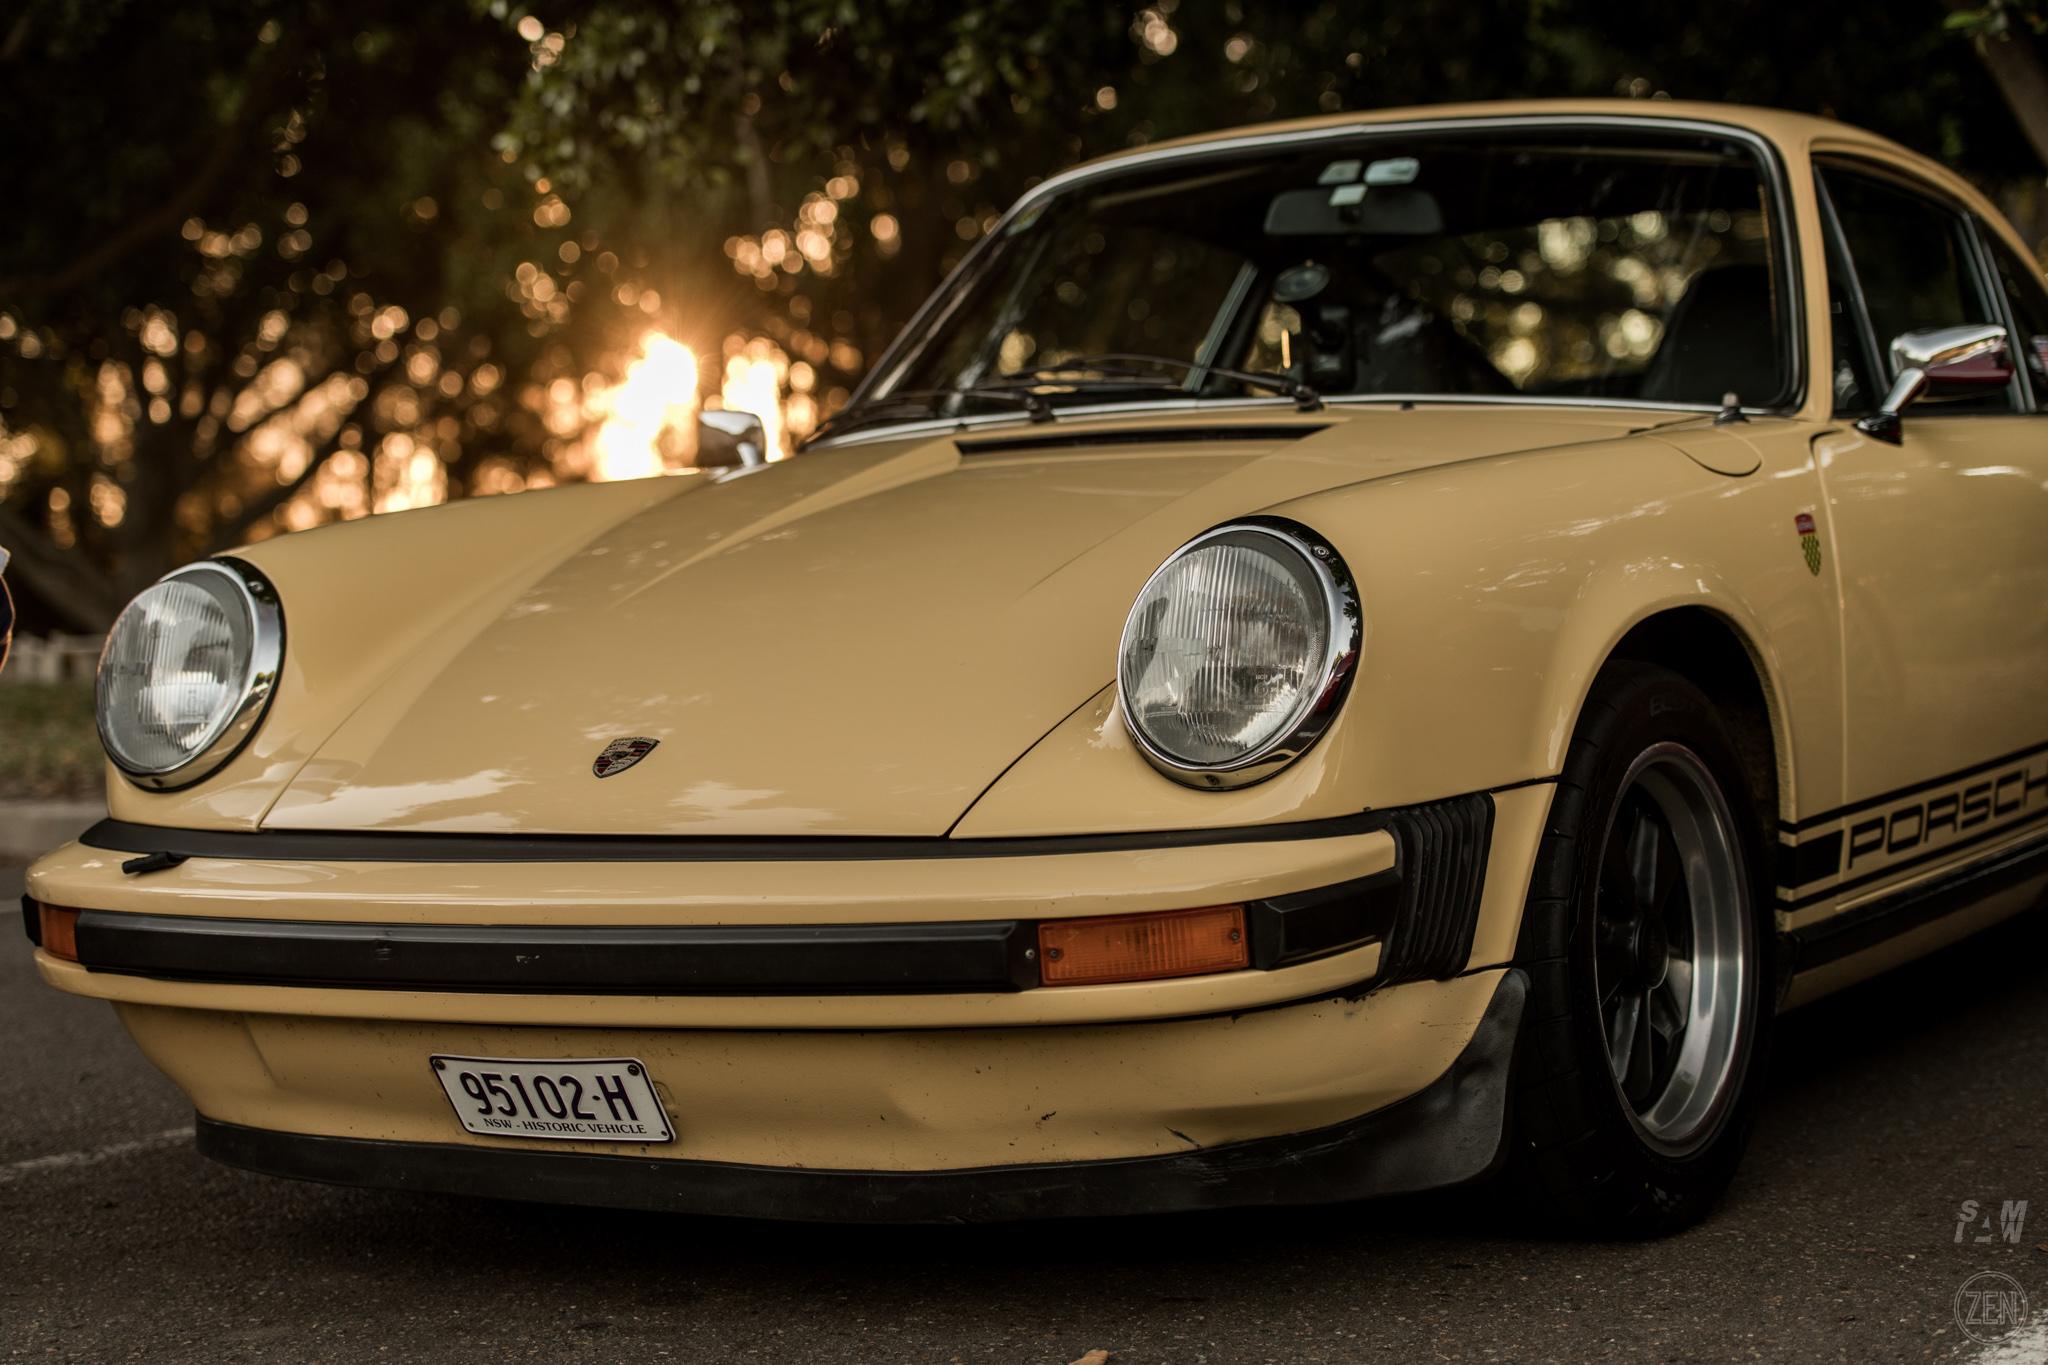 2019-10-27 - Autohaus Porsches & Coffee 012